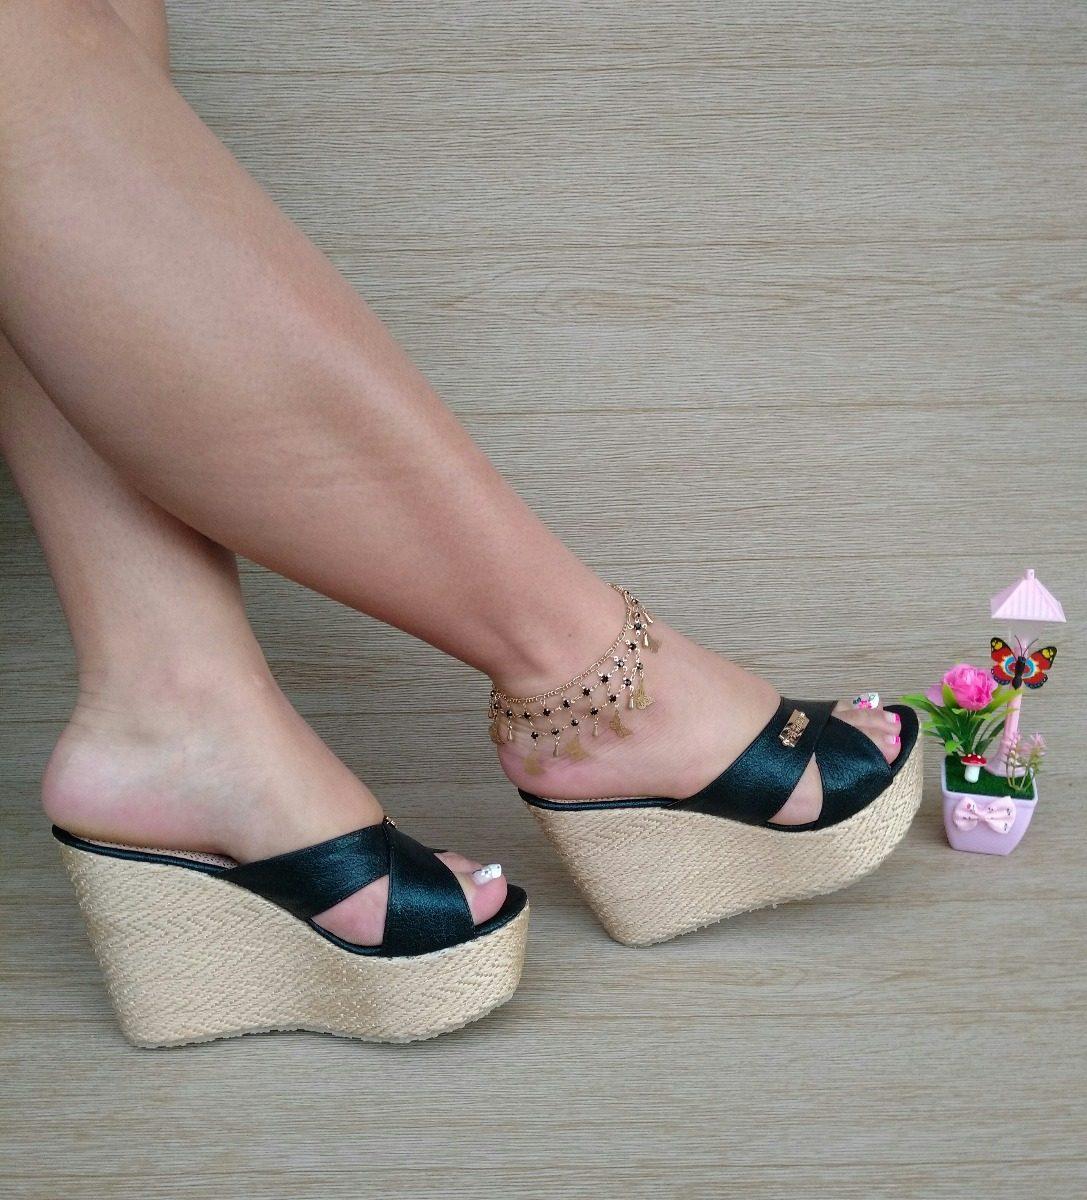 ce391b0c609 sandalia plataforma yute negra zapatos elegantes para fiesta. Cargando zoom.